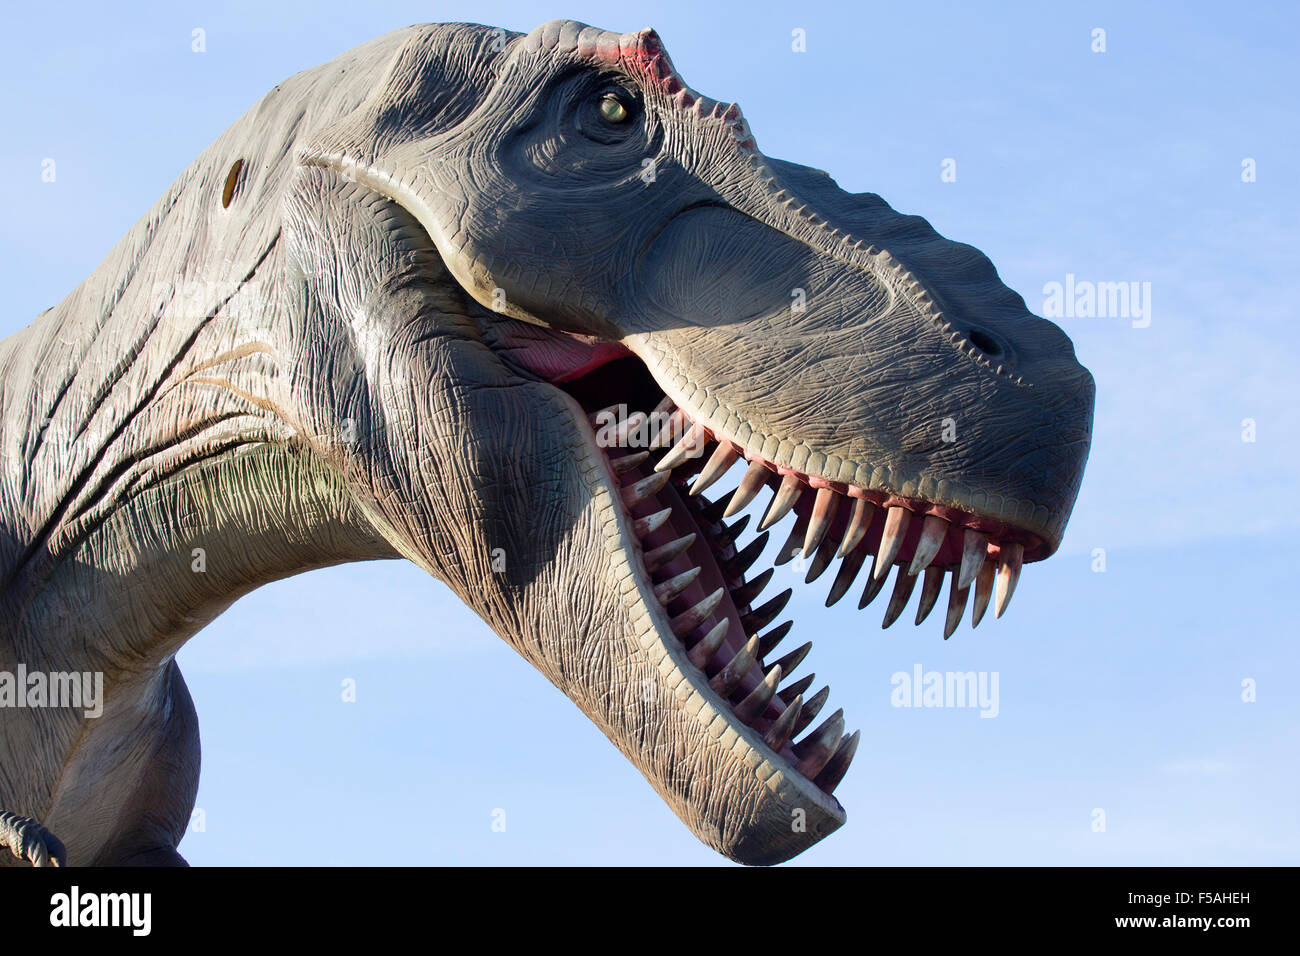 Allosaurus dinosaur model at the Calgary Zoo prehistoric park - Stock Image